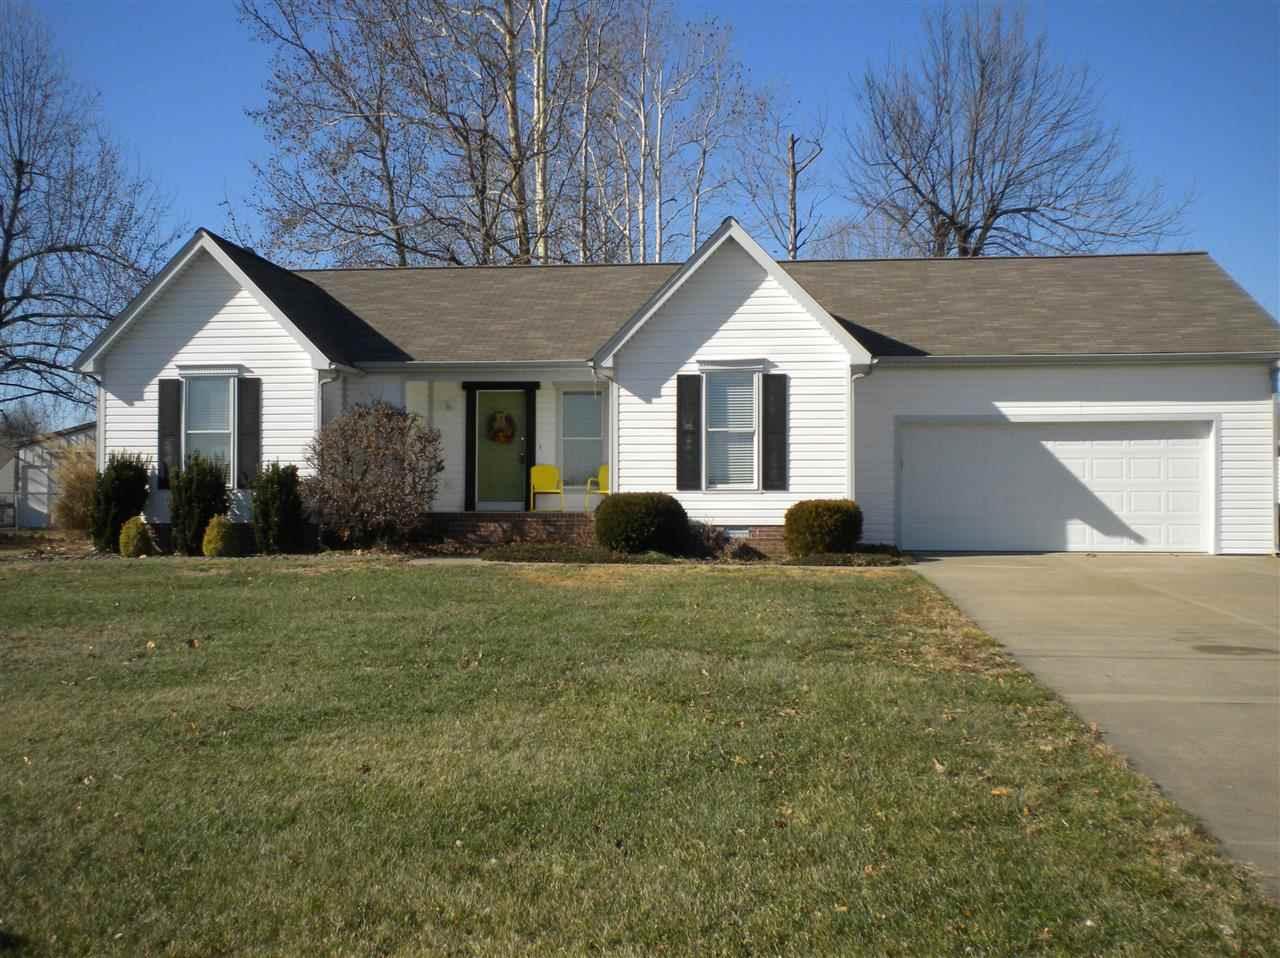 Real Estate for Sale, ListingId: 29975872, West Paducah,KY42086